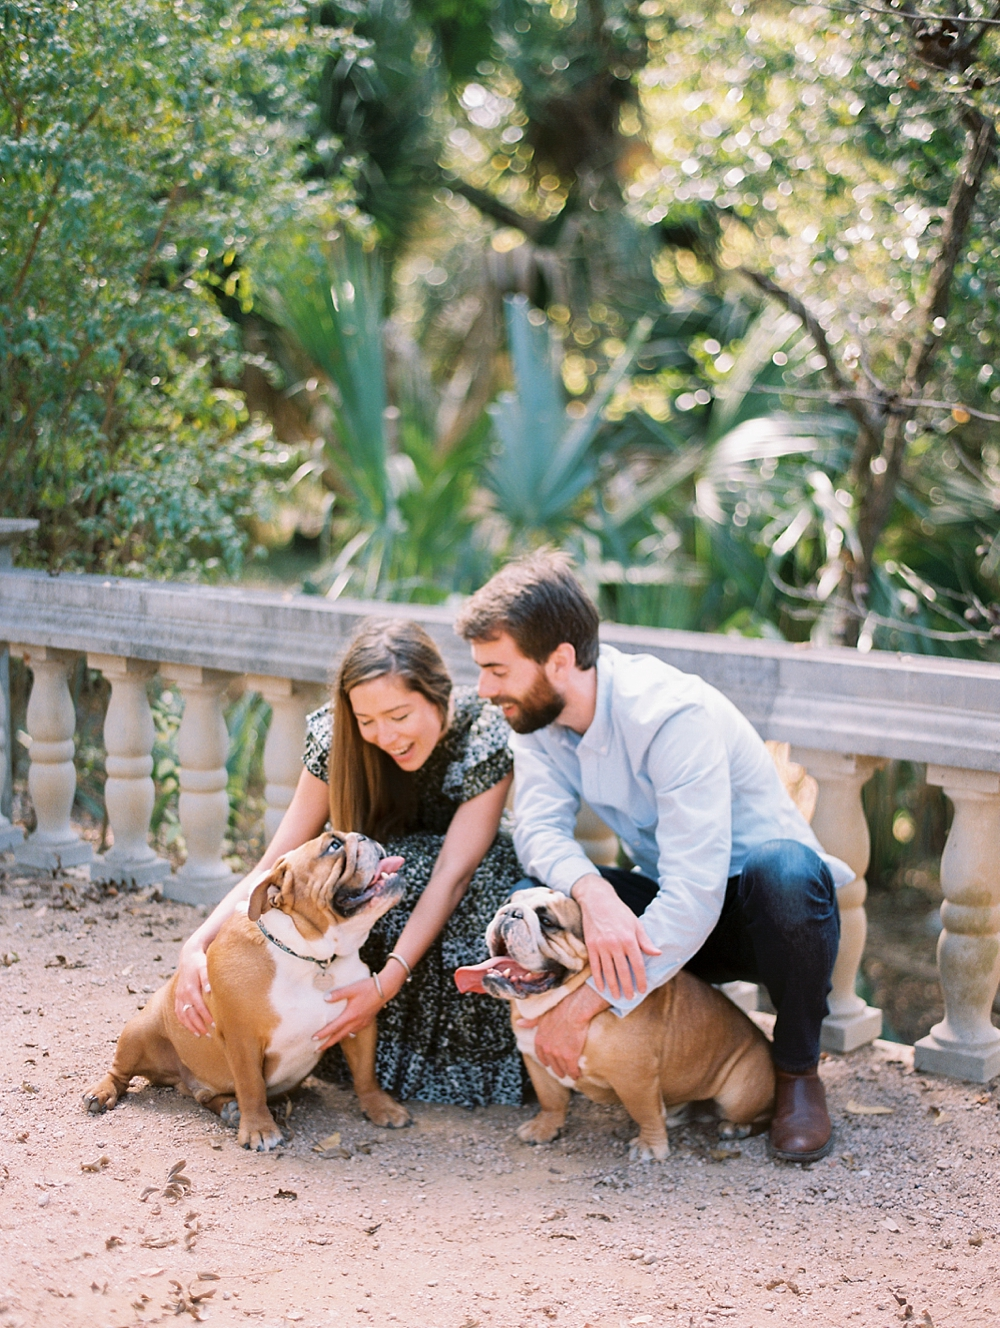 kristin-la-voie-photography-Austin-Wedding-Photographer-laguna-gloria-commodore-perry-estate-engagement-34